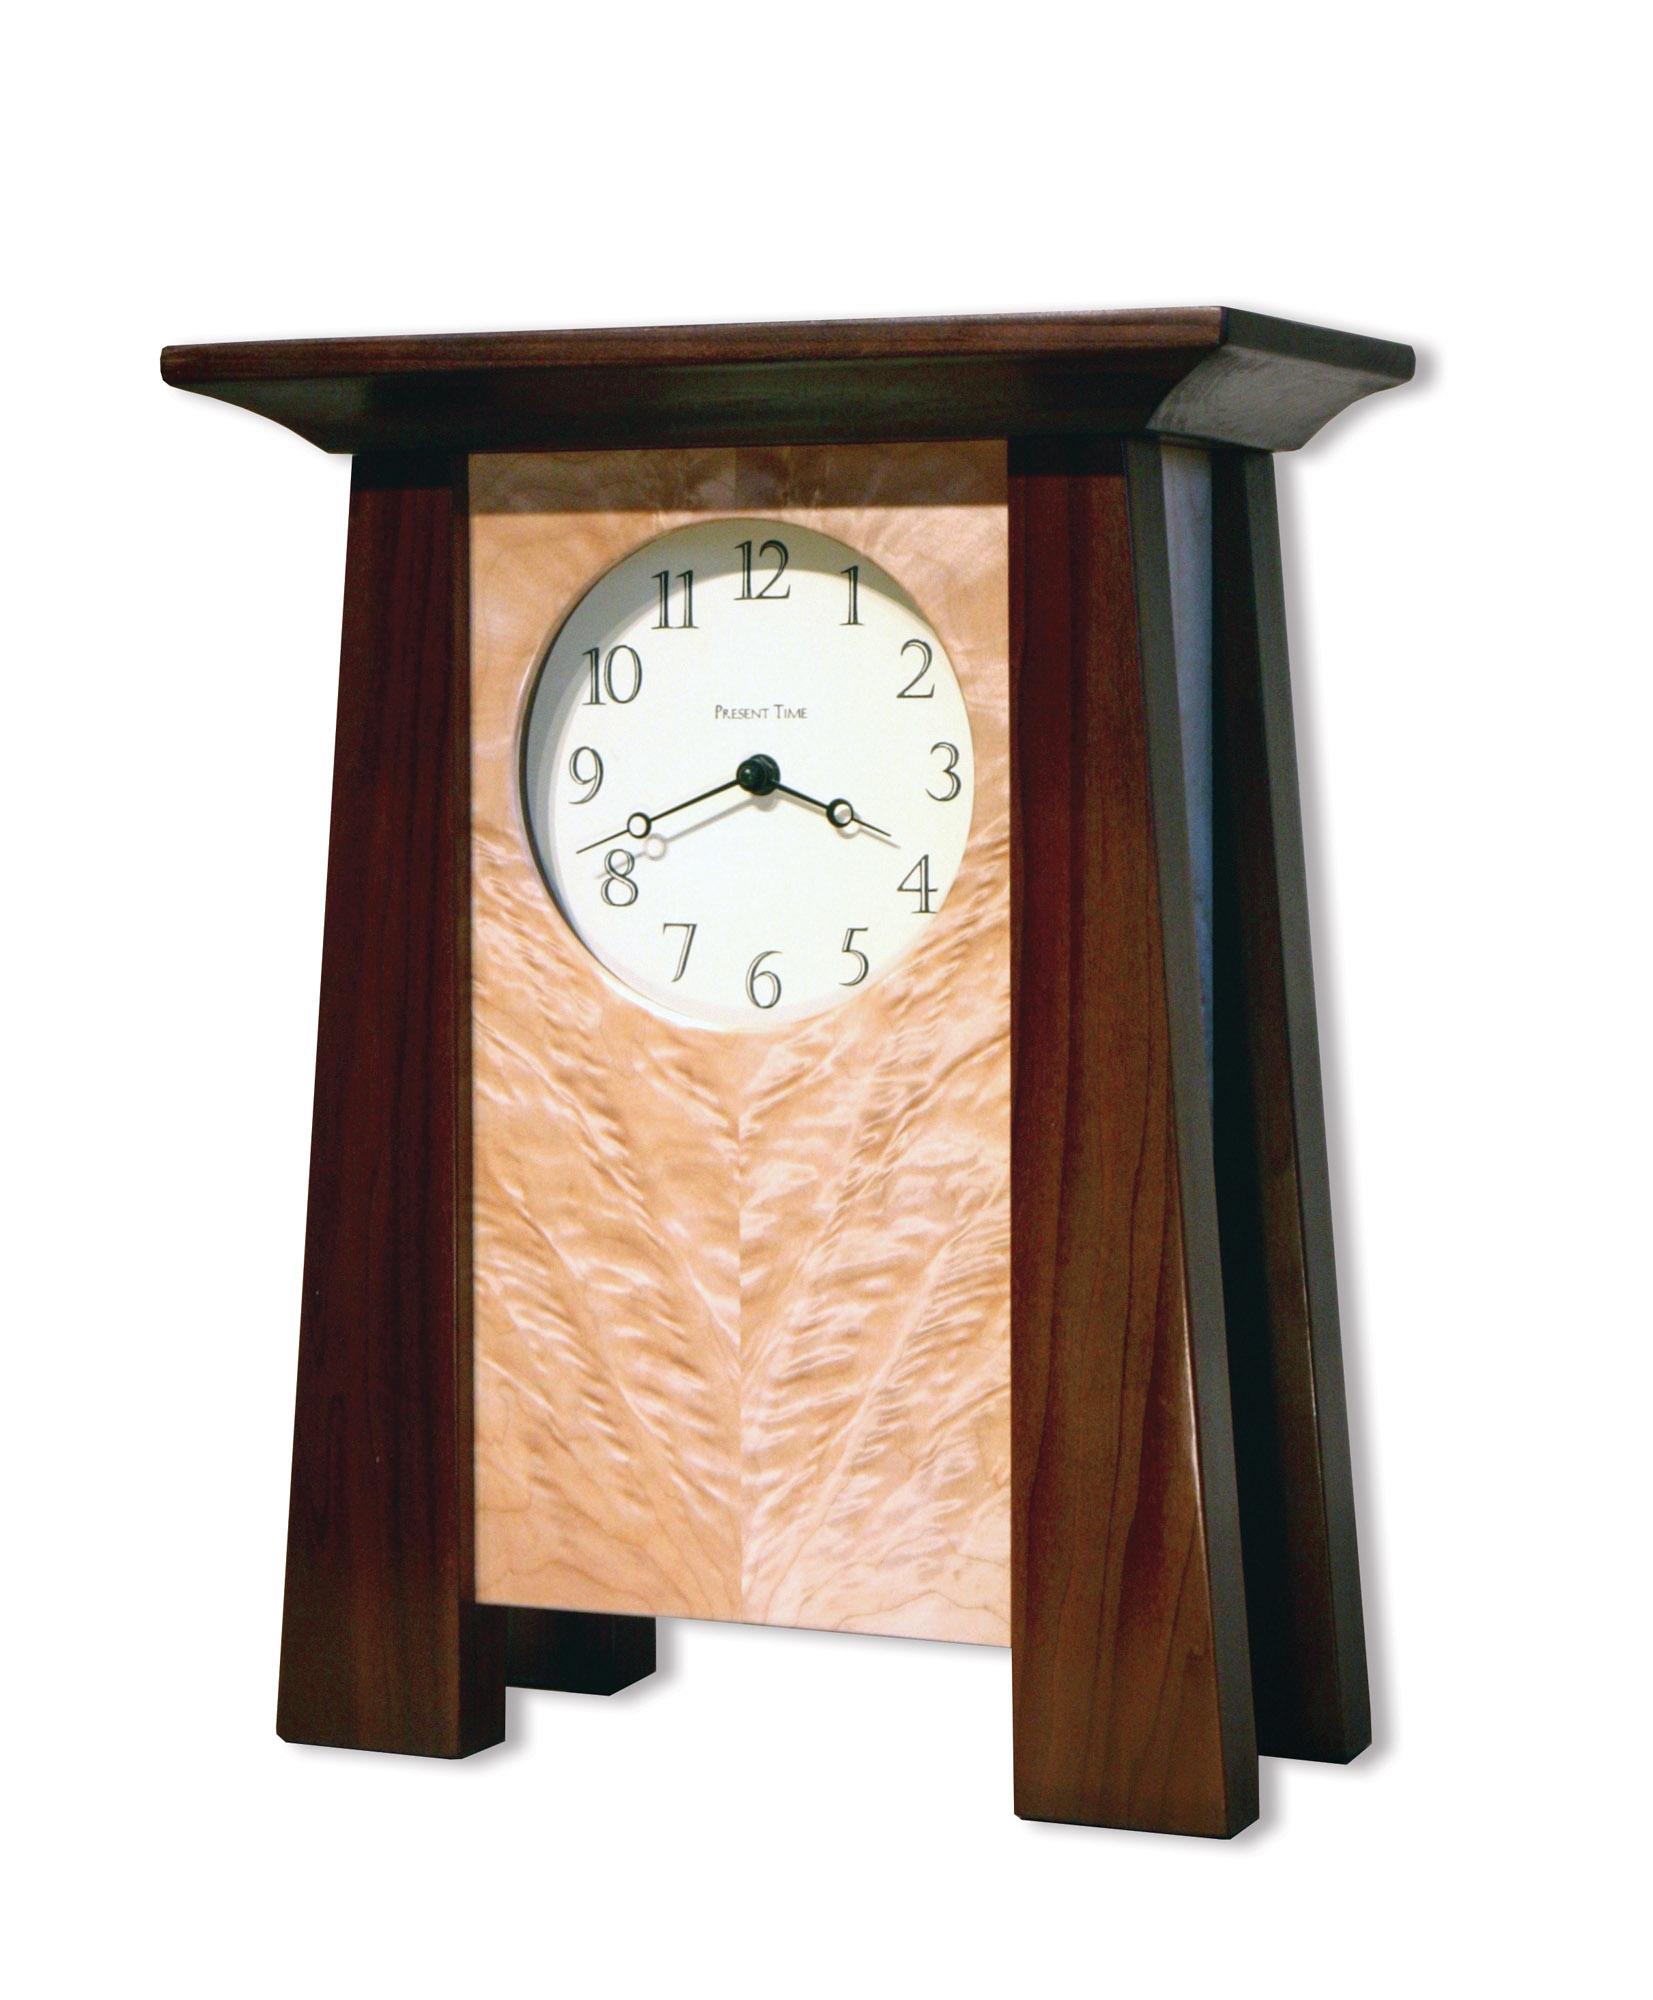 The Temple Bridge clock.